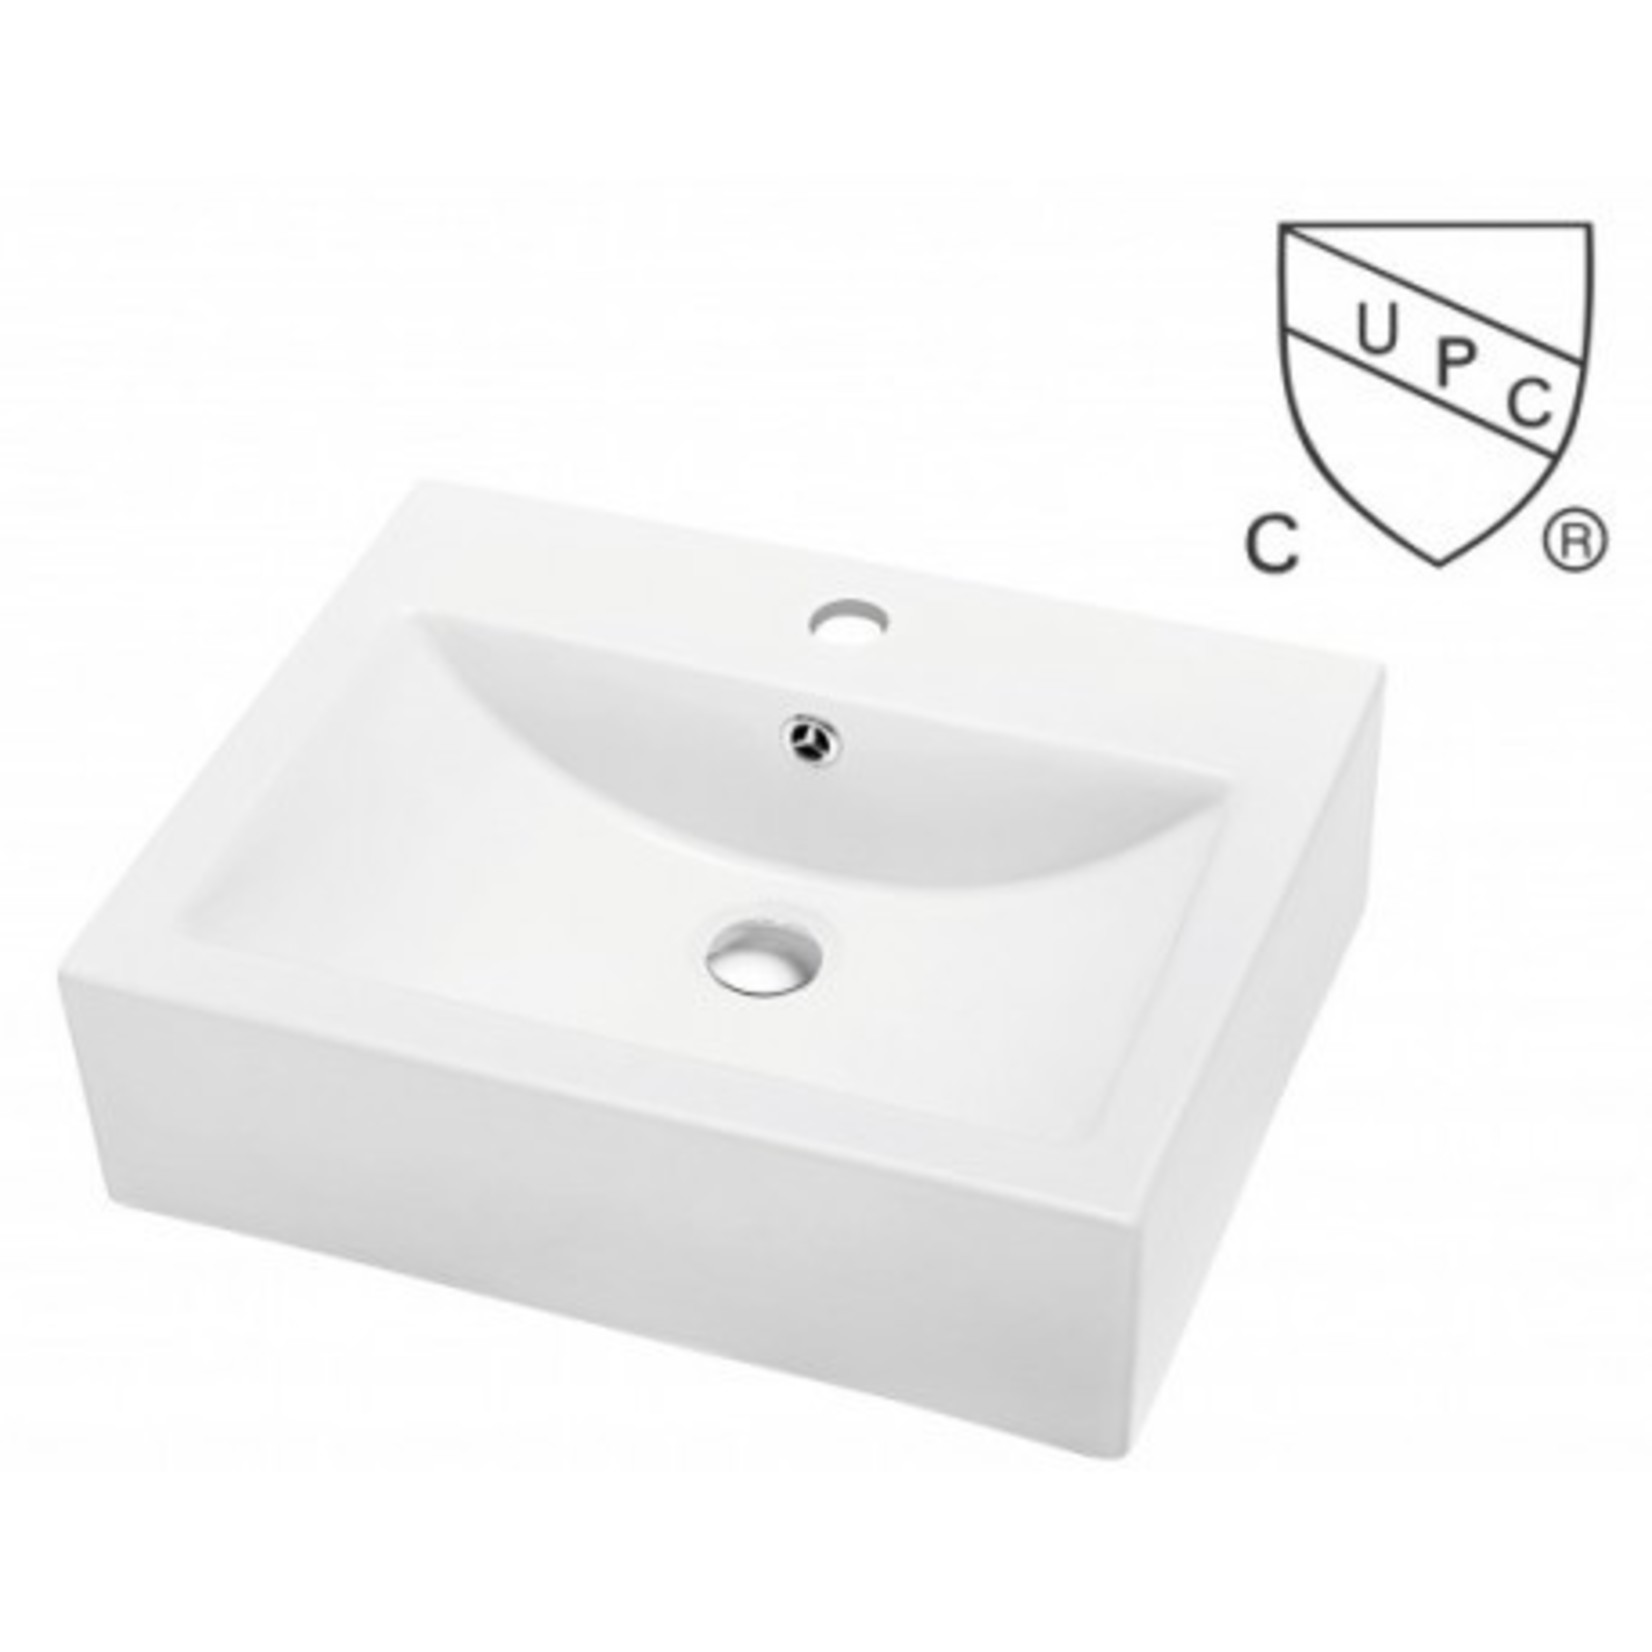 Washbasin Vessel - Countertop mounting S-200